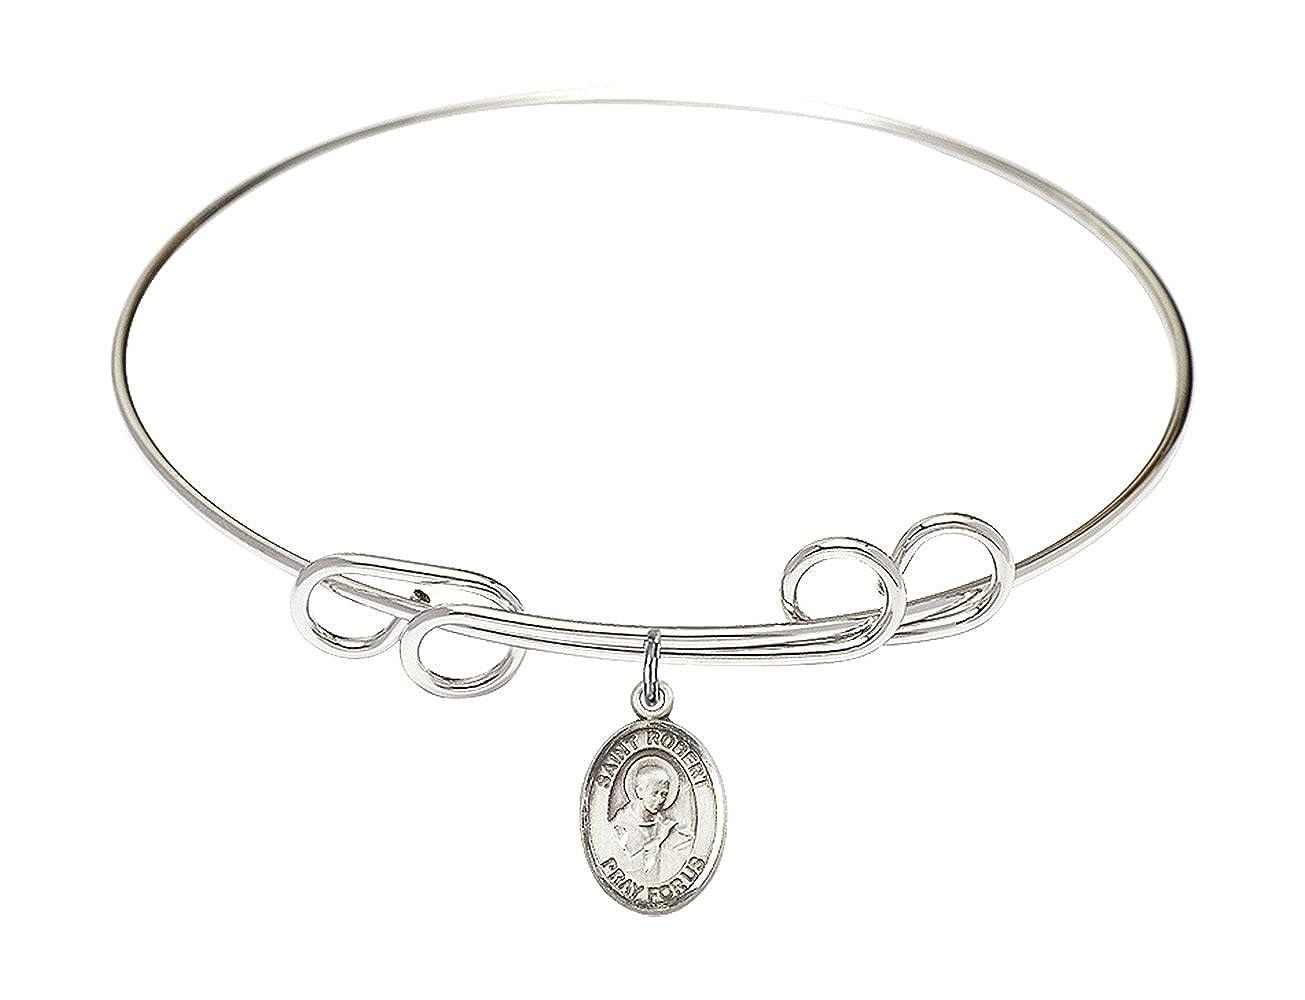 DiamondJewelryNY Double Loop Bangle Bracelet with a St Robert Bellarmine Charm.